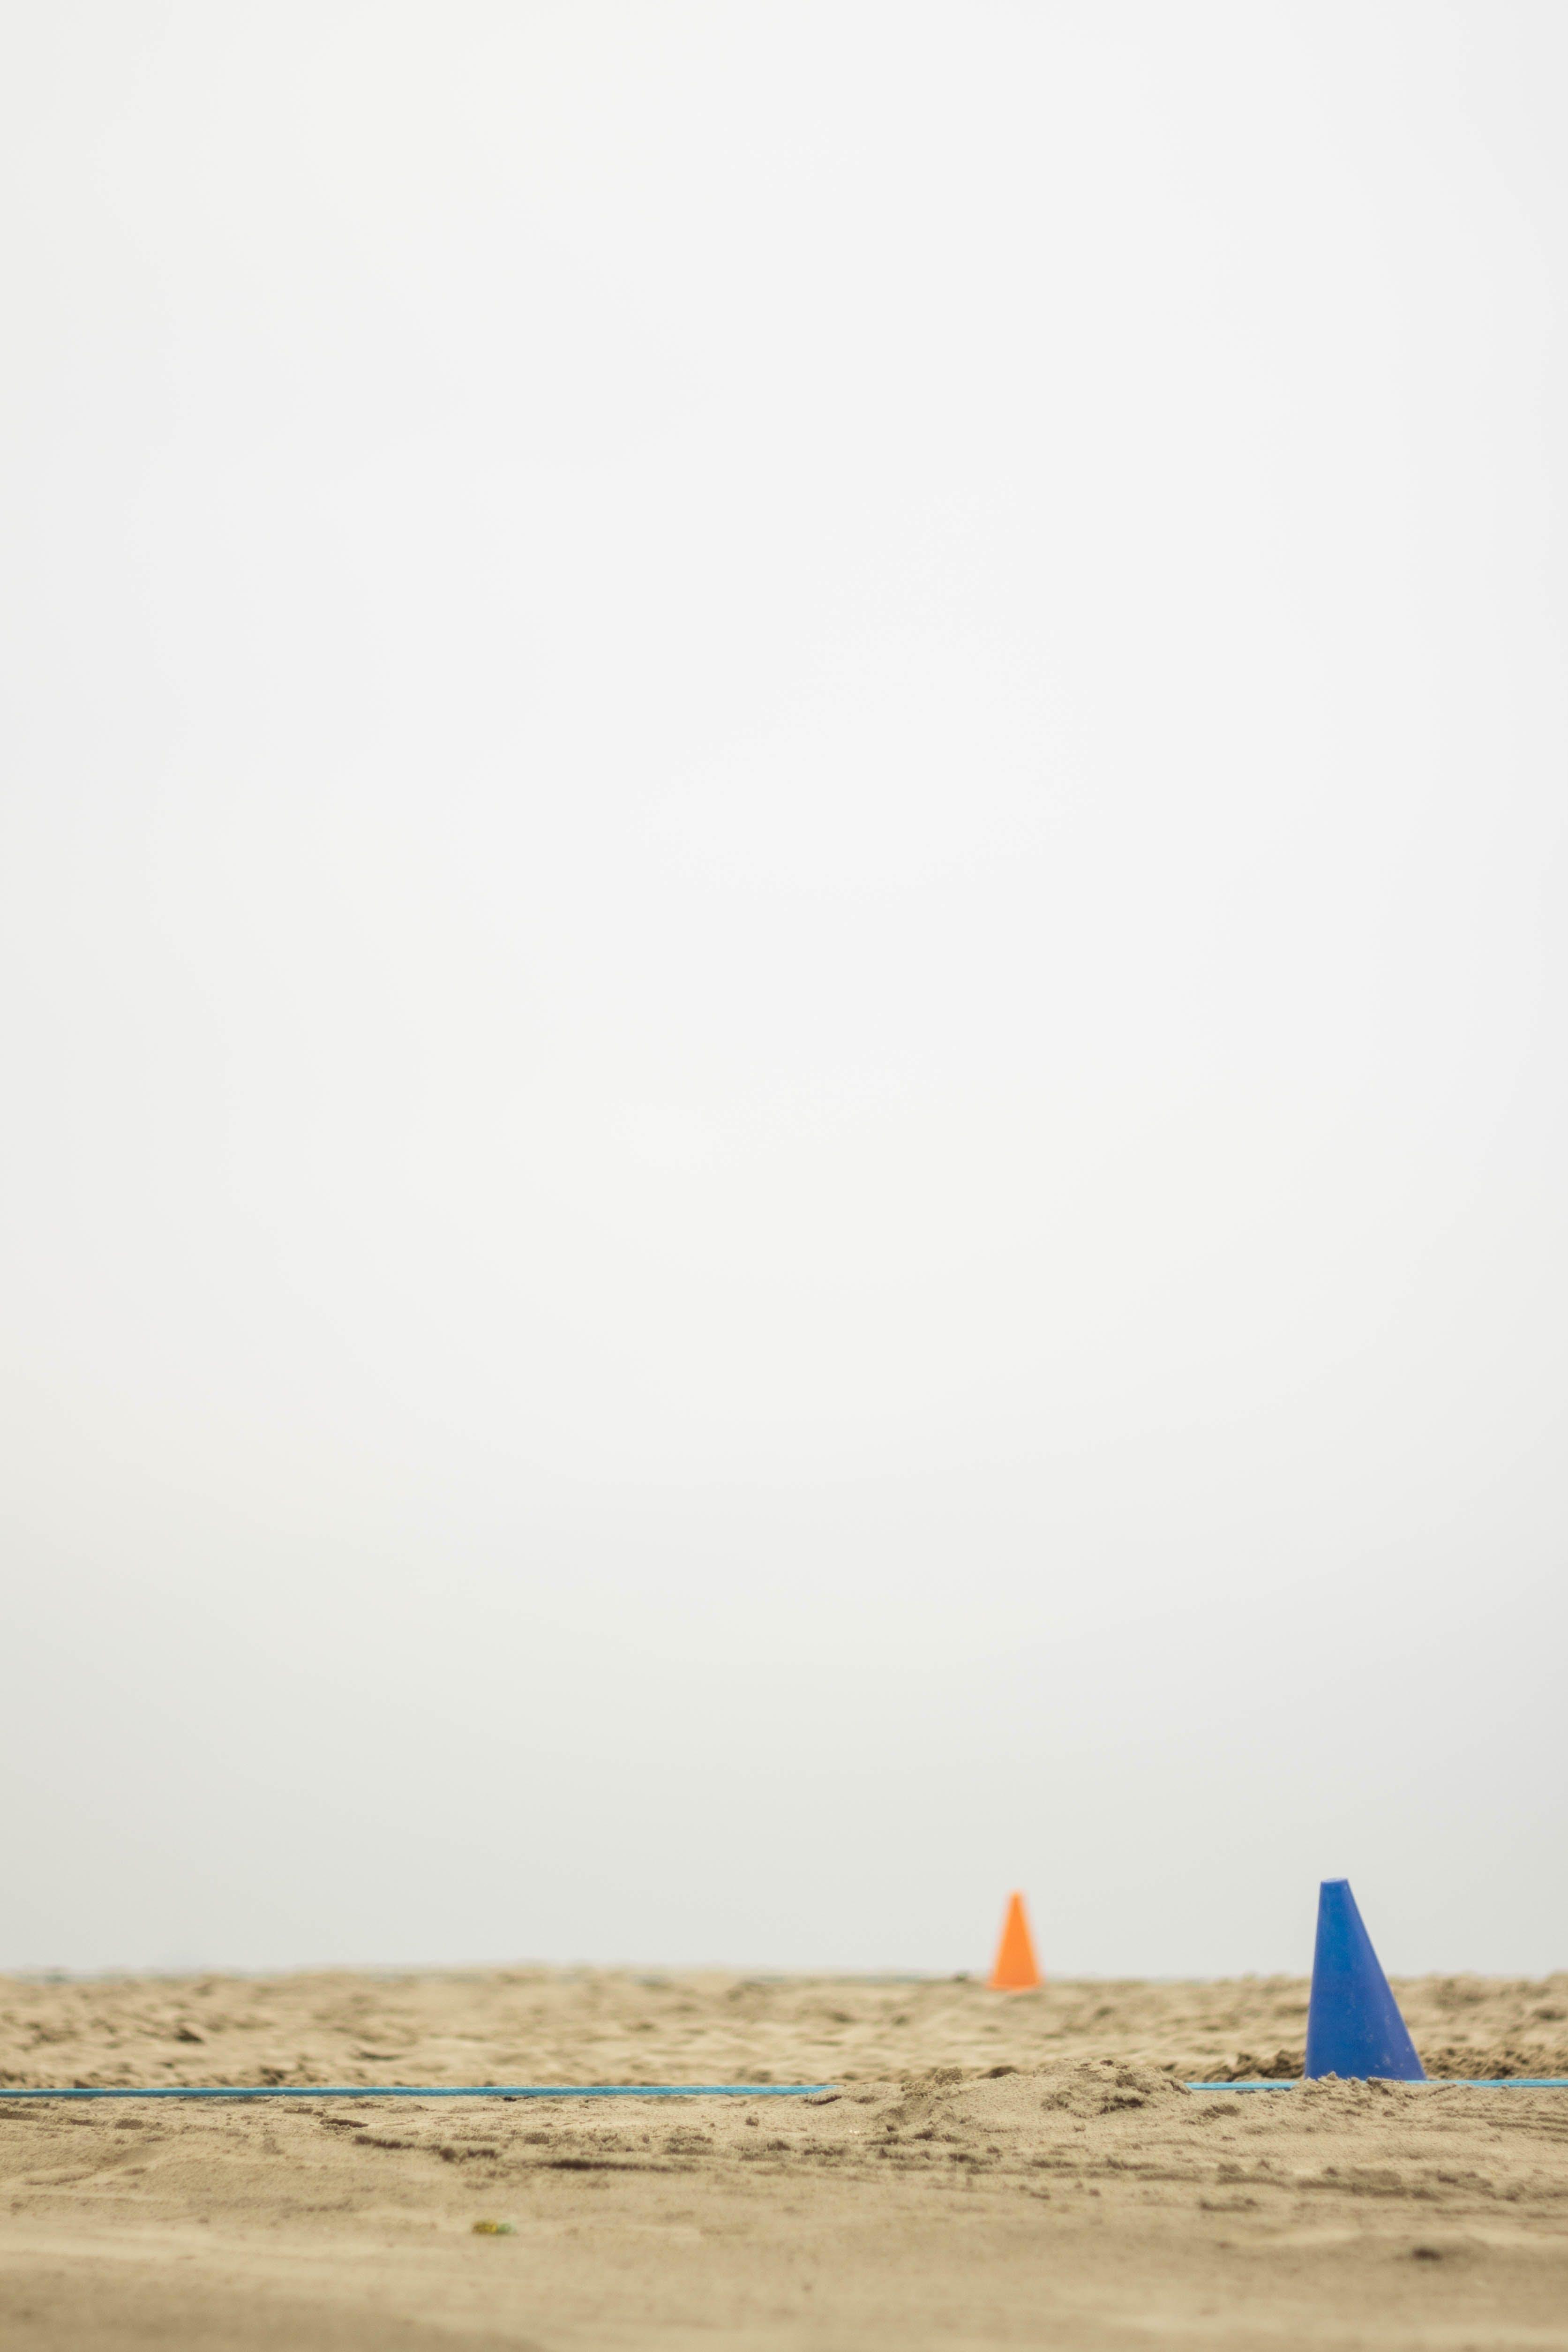 Blue and Orange Cones on Sand